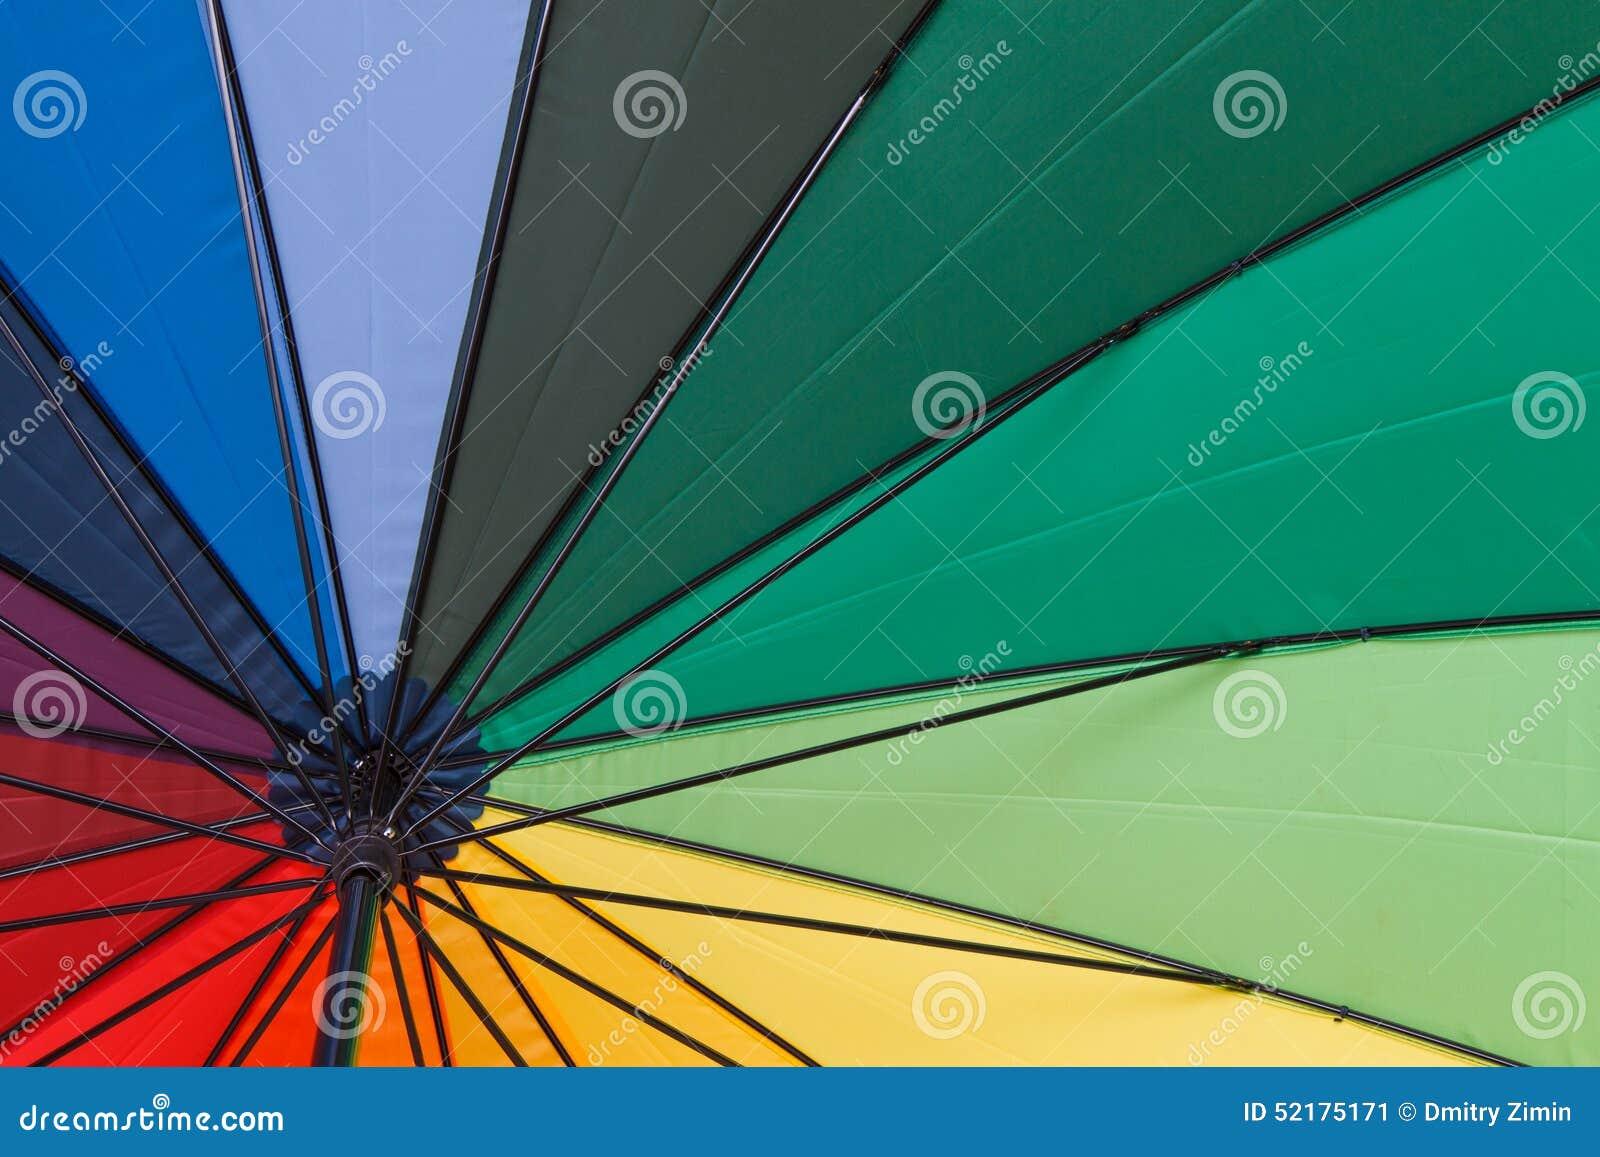 Colorful umbrella stock image. Image of parasol, green - 52175171